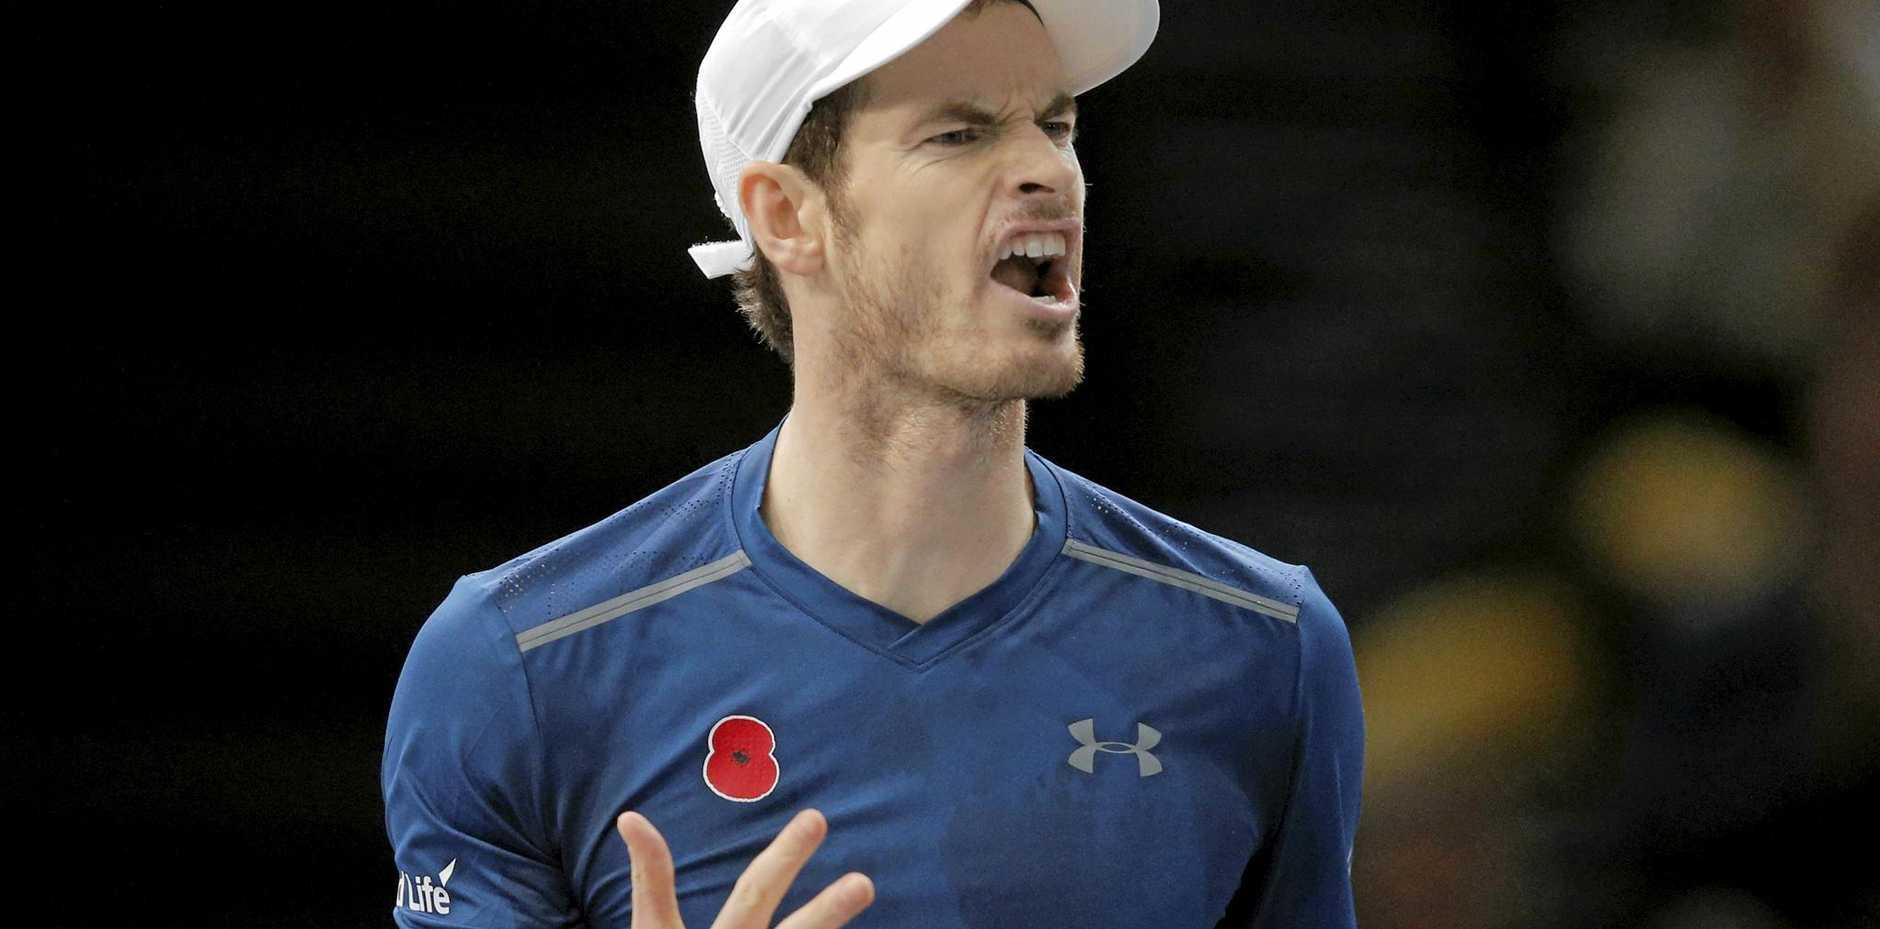 Britain's Andy Murray at the Paris Masters.